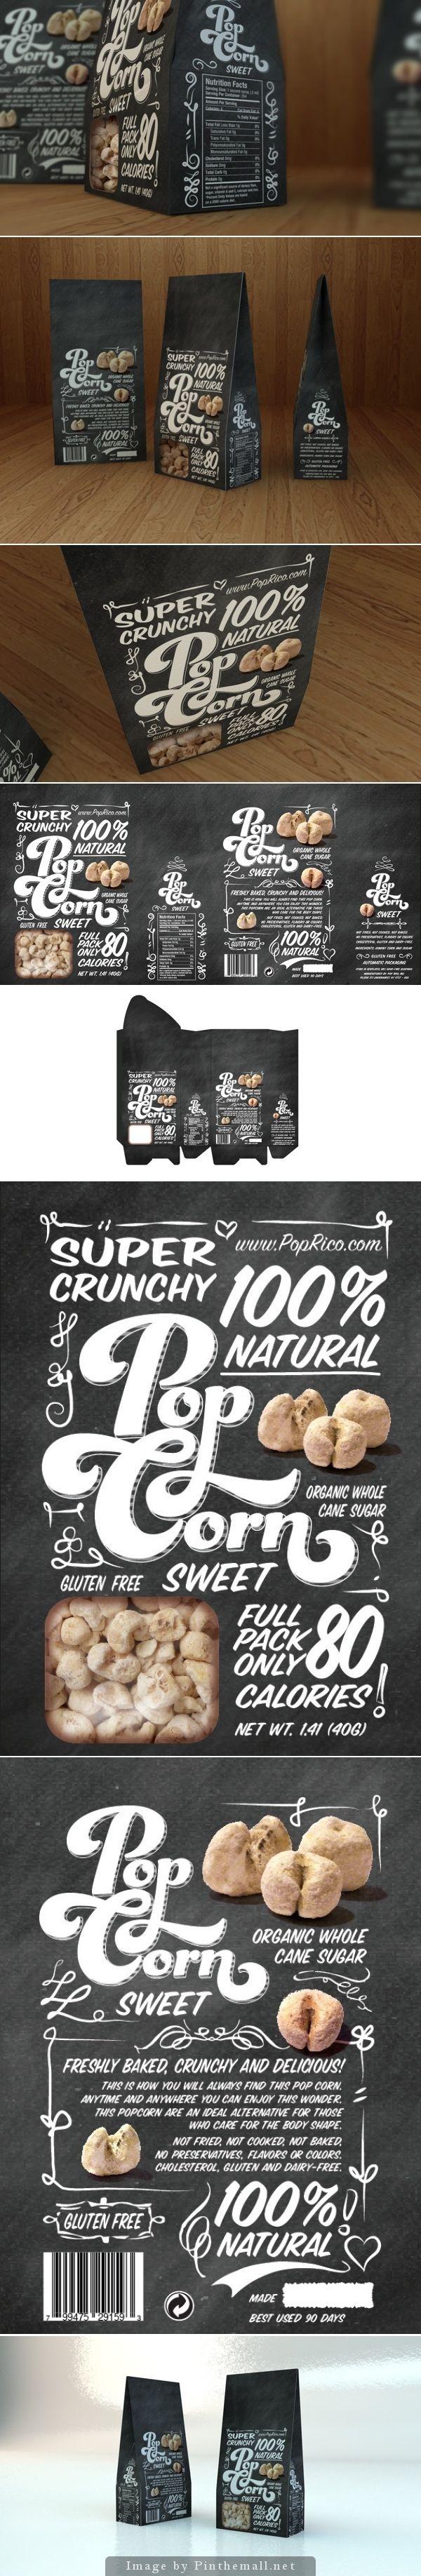 Sweet Popcorn PD